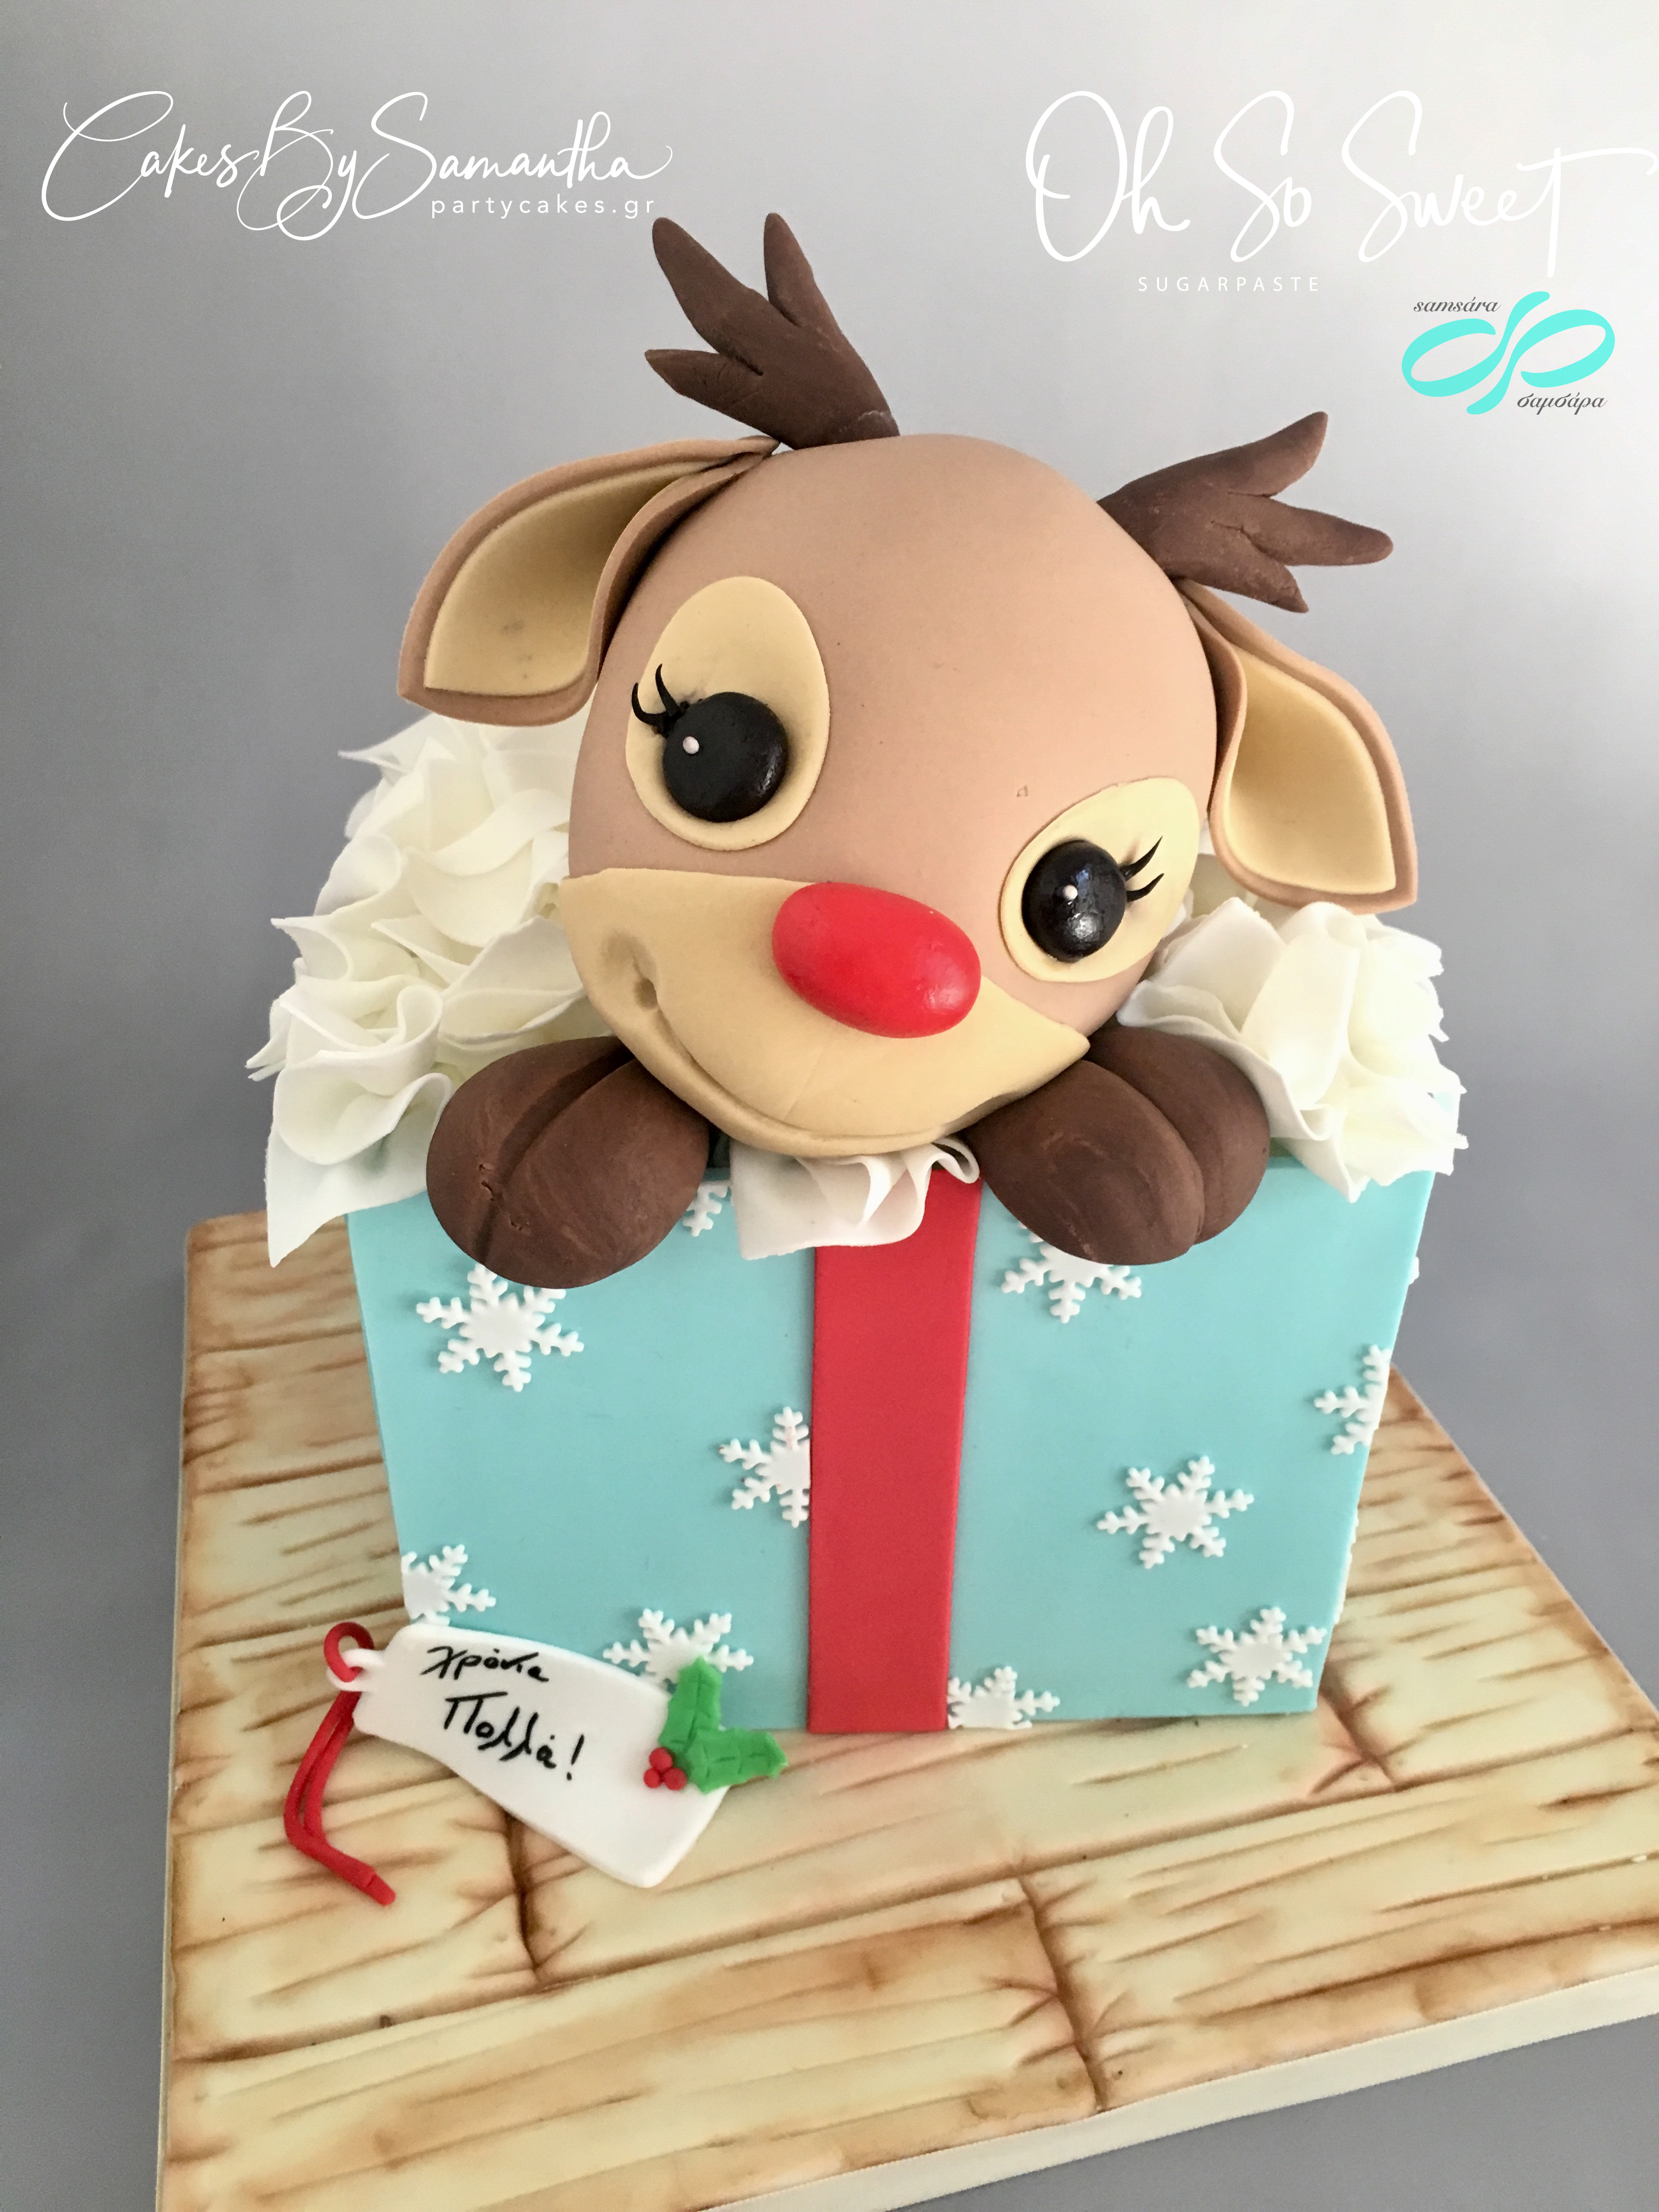 Reindeer present cake 1